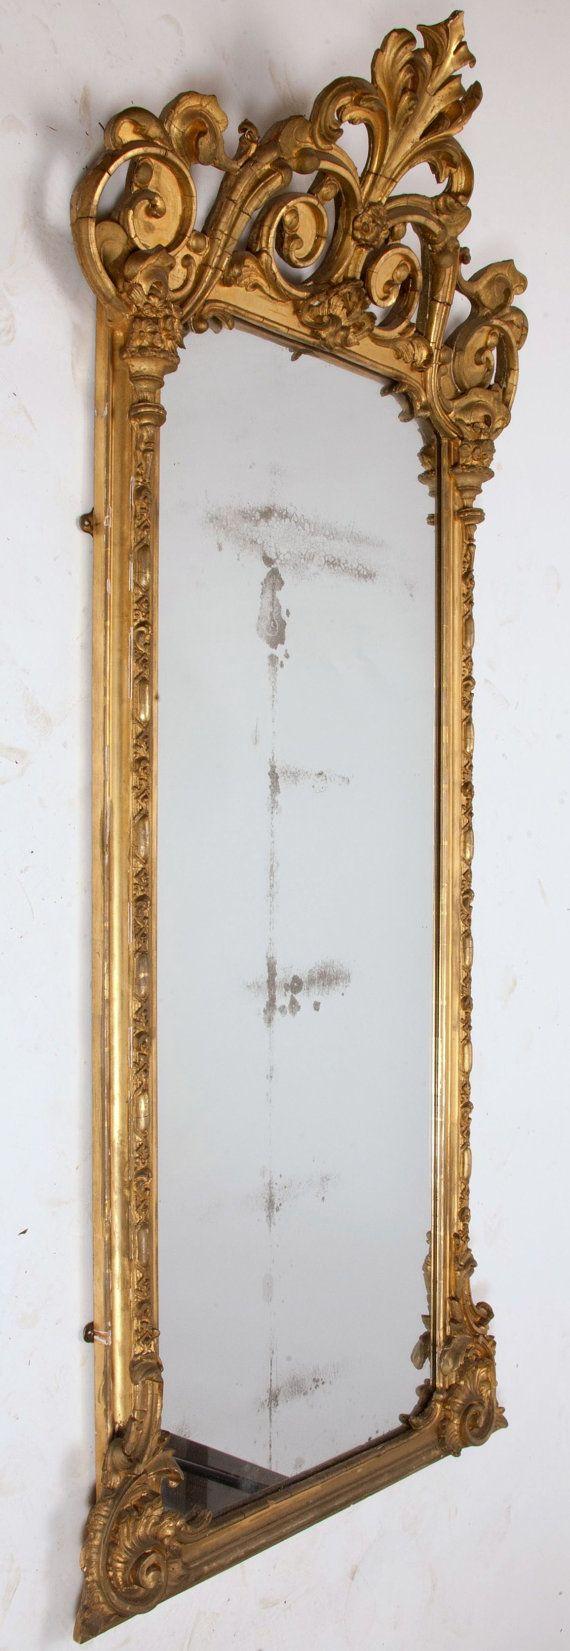 Best 25 victorian mirror ideas on pinterest victorian floor best 25 victorian mirror ideas on pinterest victorian floor mirrors large gold mirror and black makeup table amipublicfo Gallery